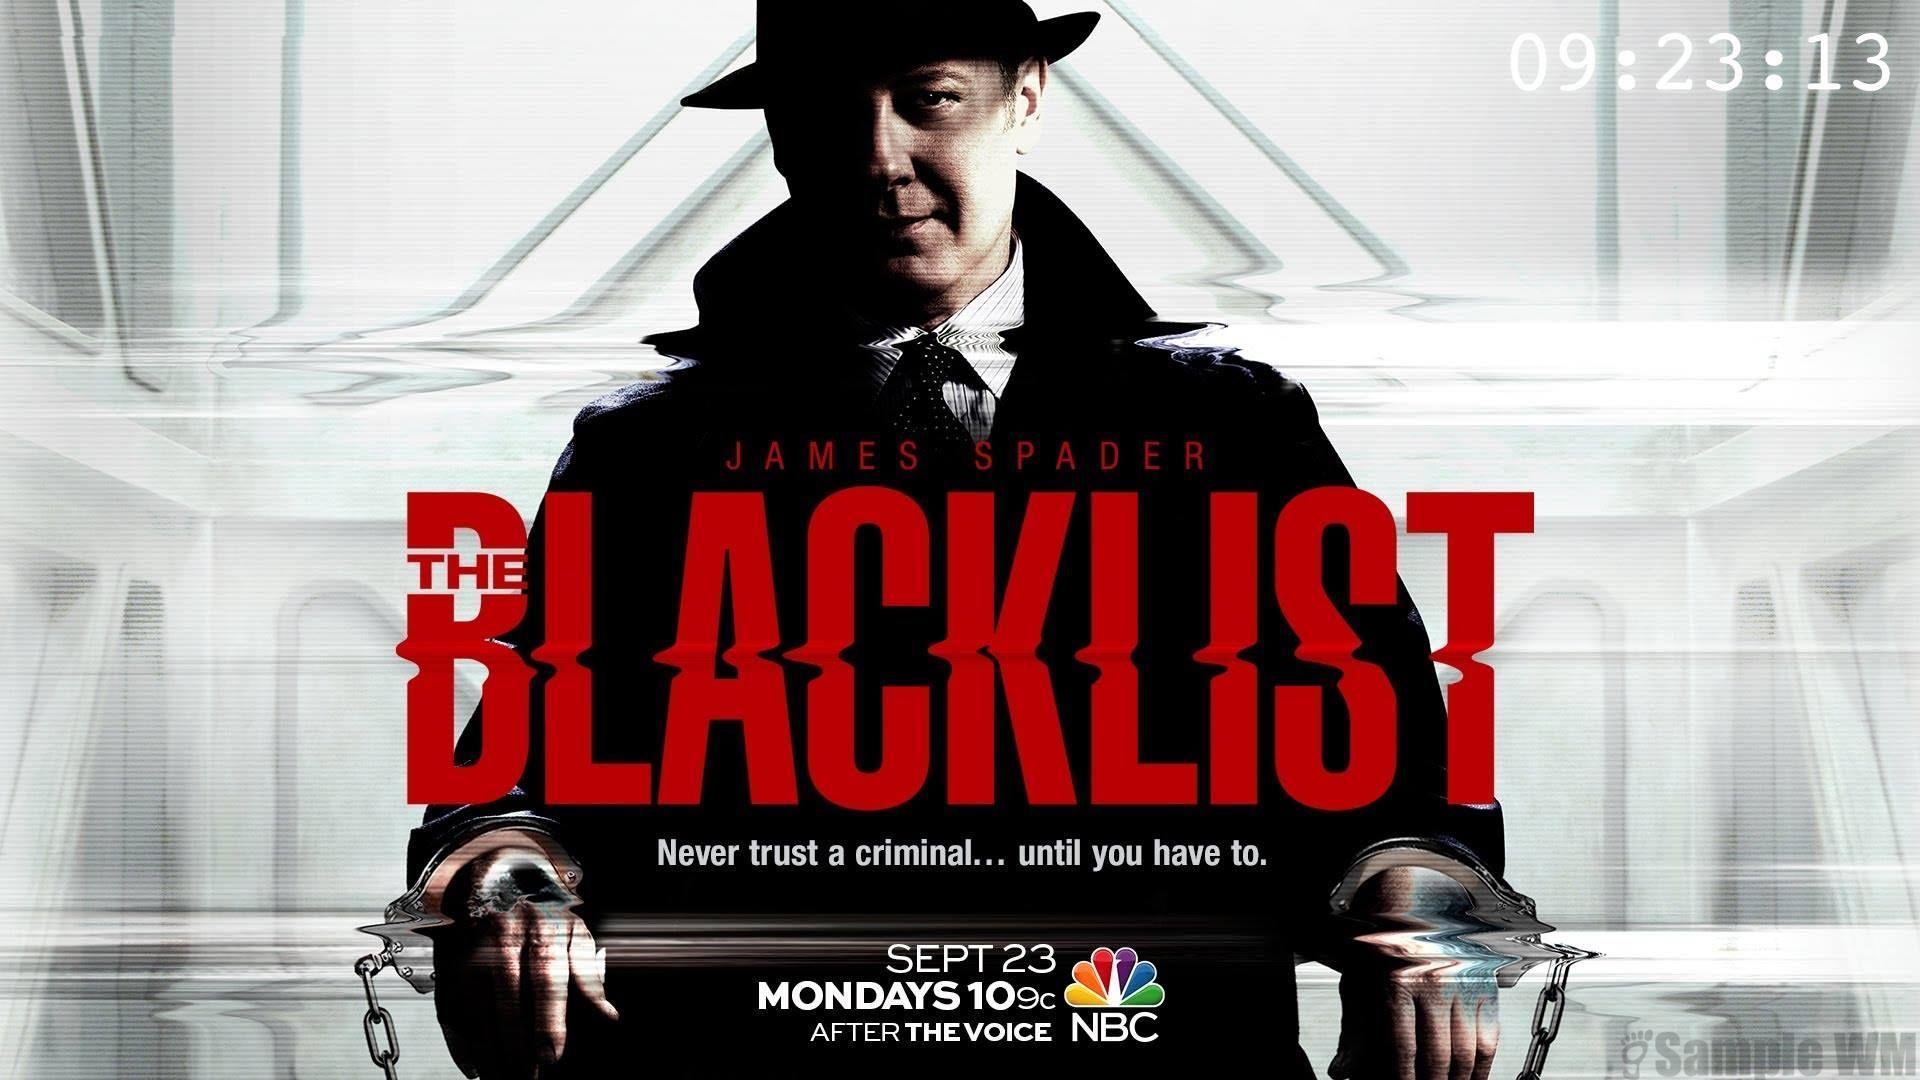 The Blacklist   The Blacklist Wallpaper 35676705 1920x1080